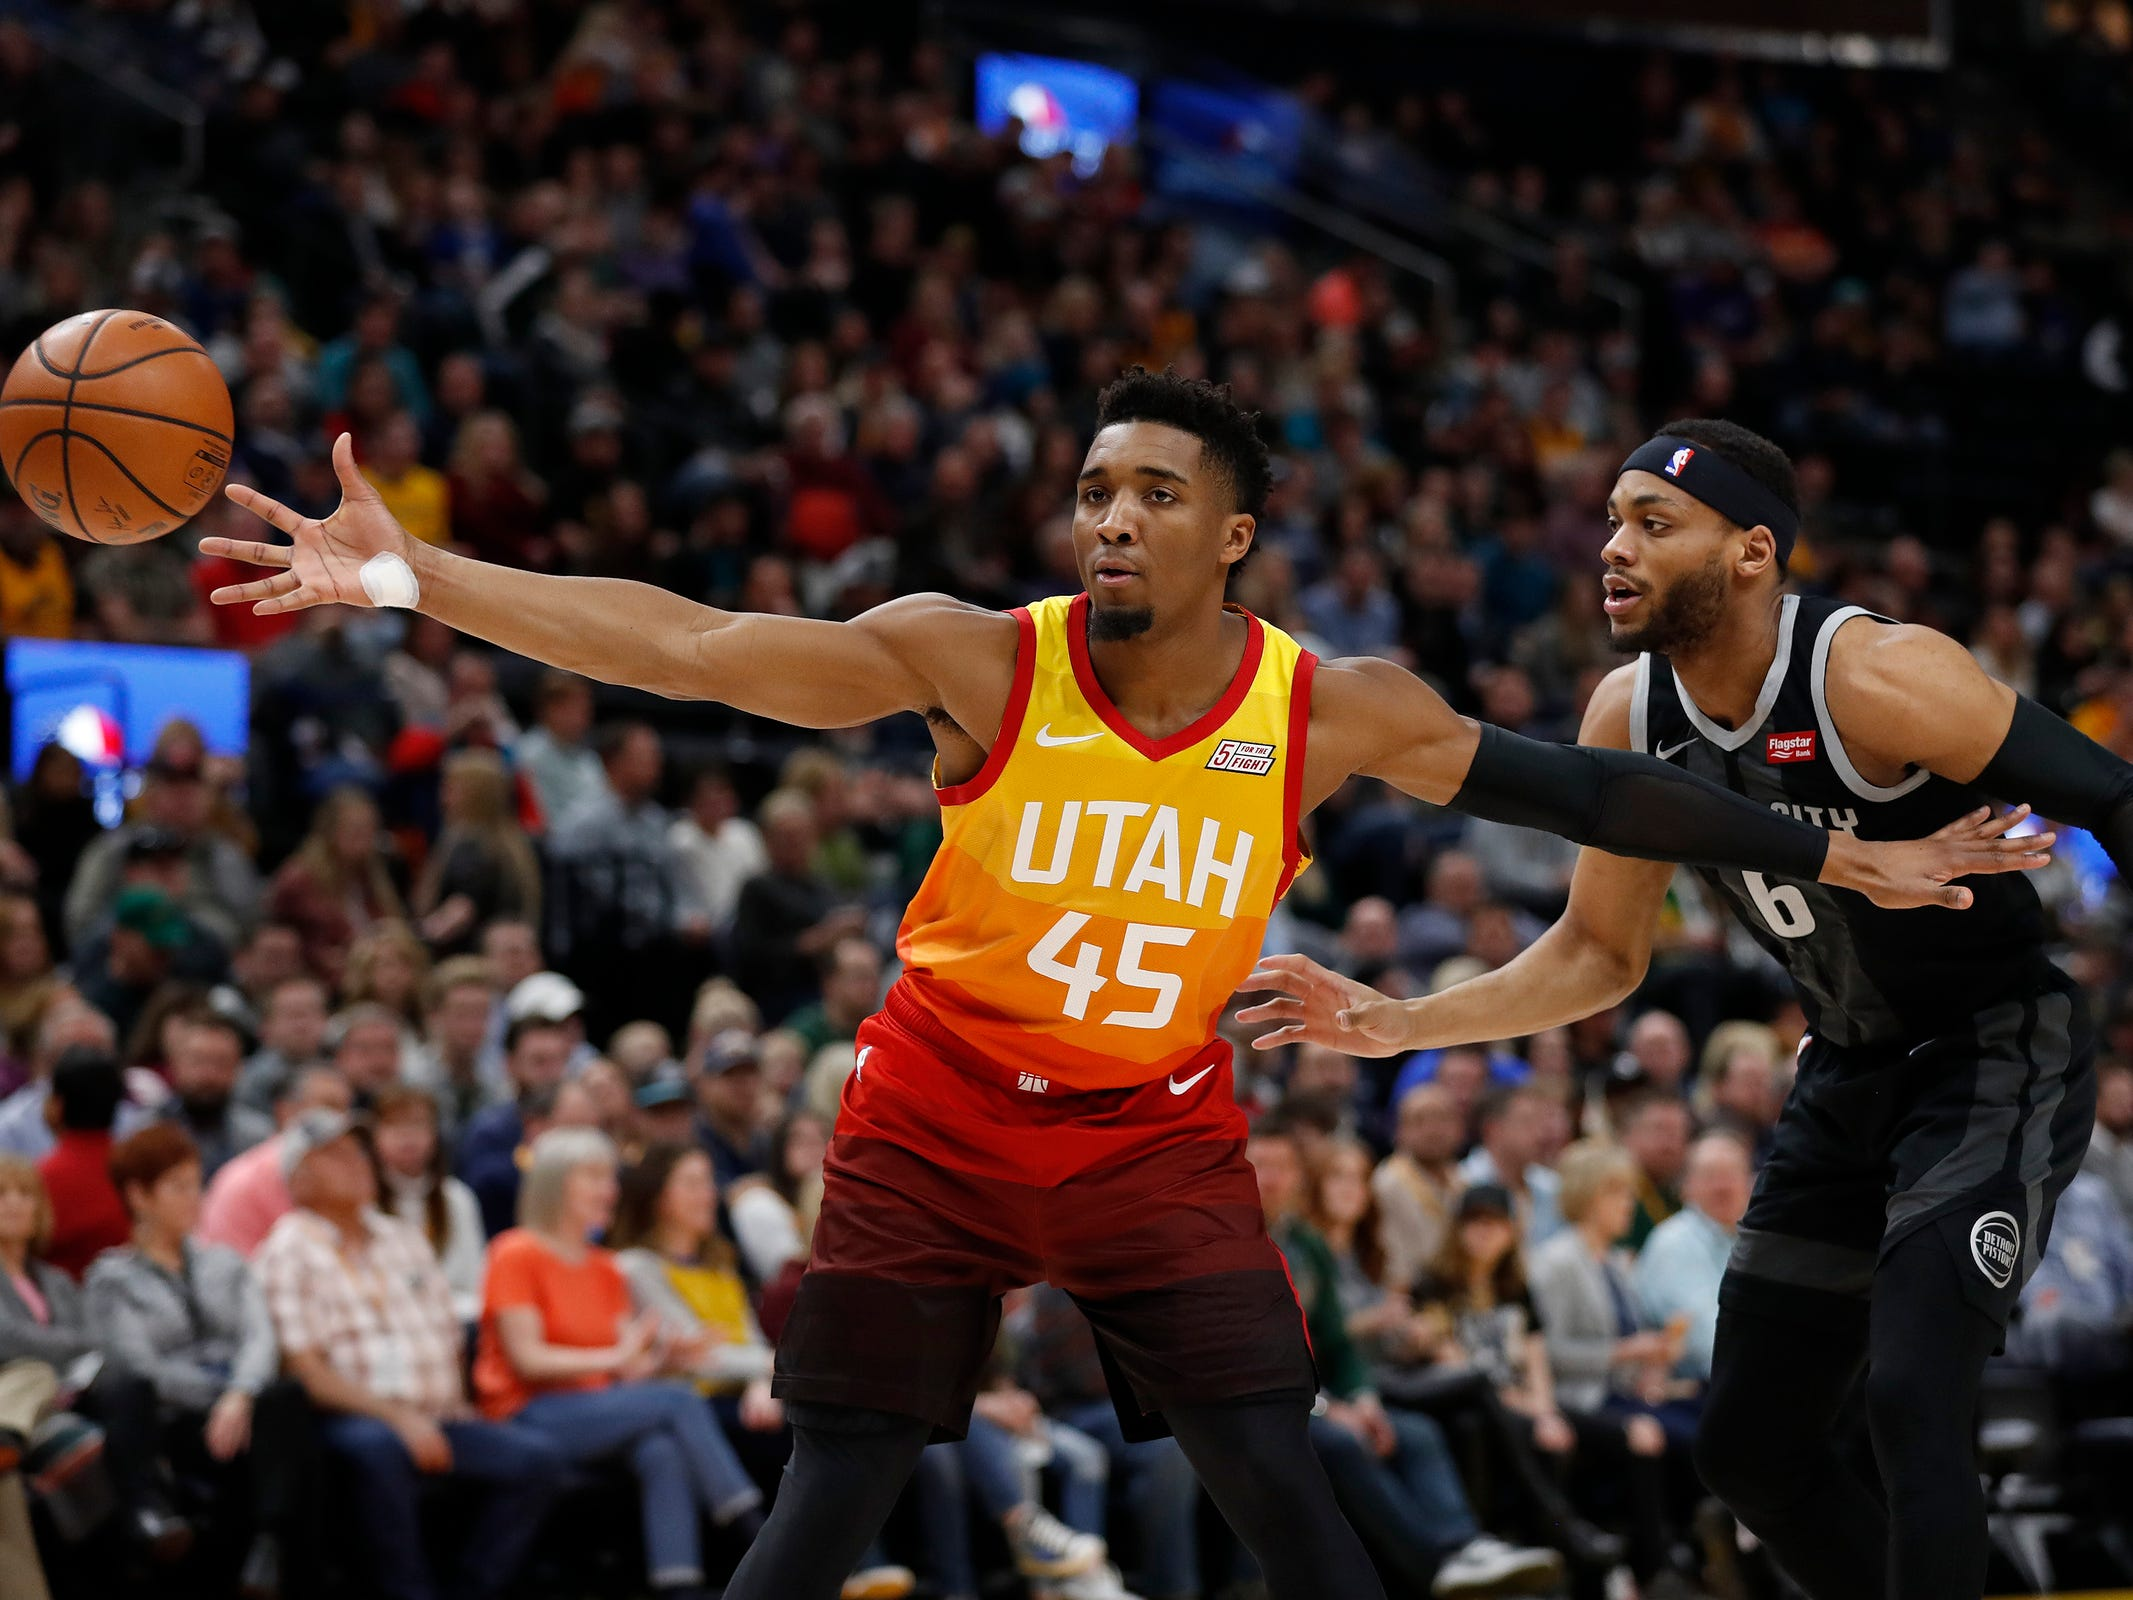 Detroit Pistons' Blake Griffin slowed by Utah Jazz in 100-94 loss